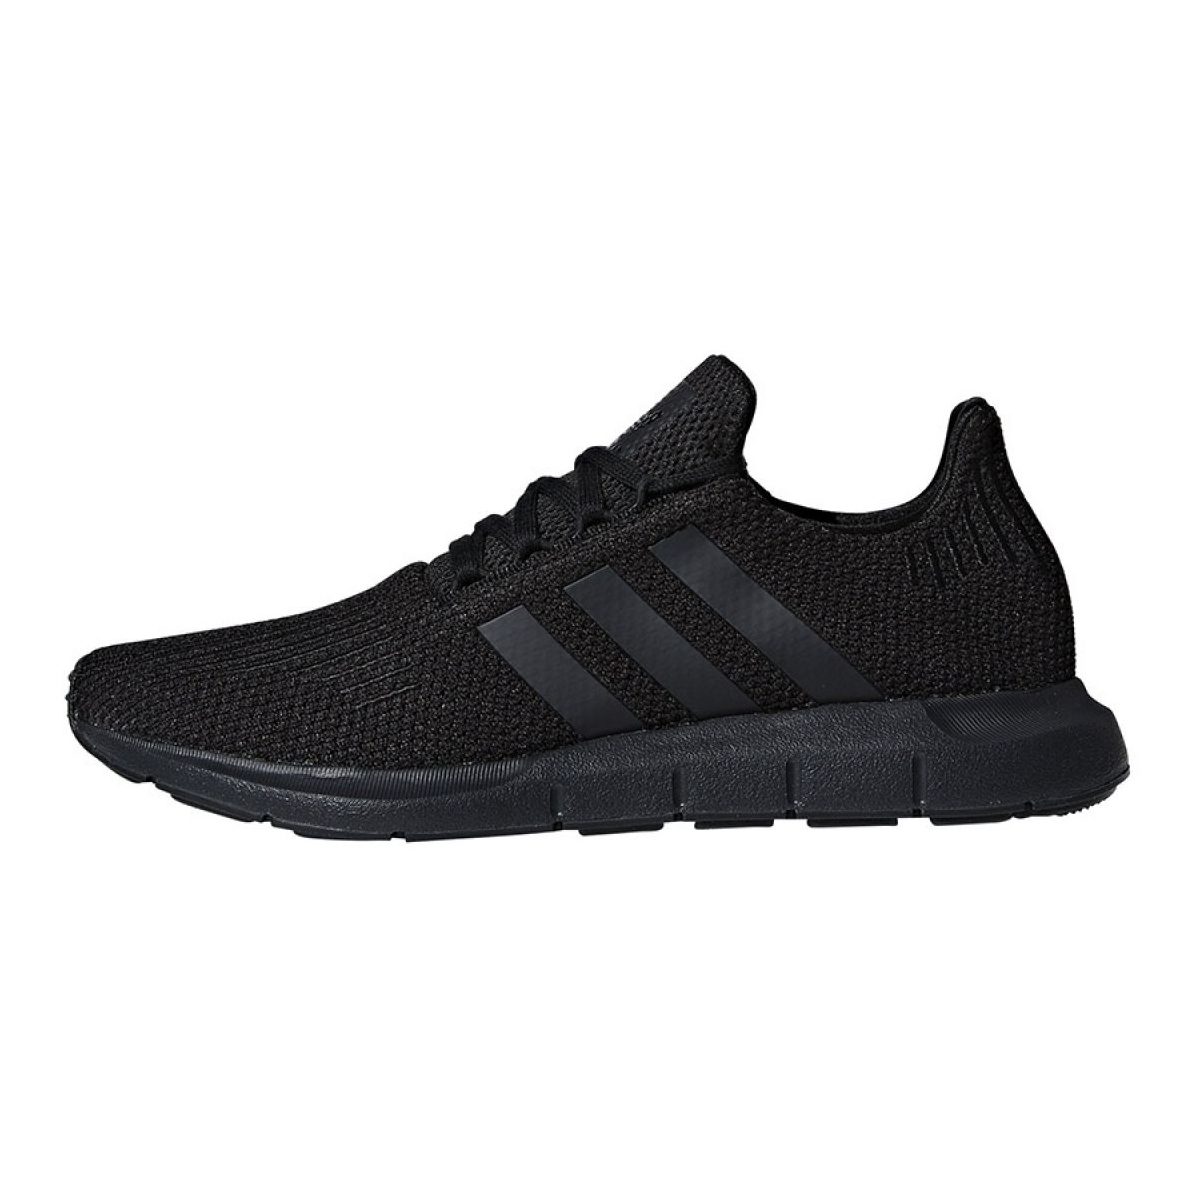 Adidas Originals Swift Run M AW0863 skor svart